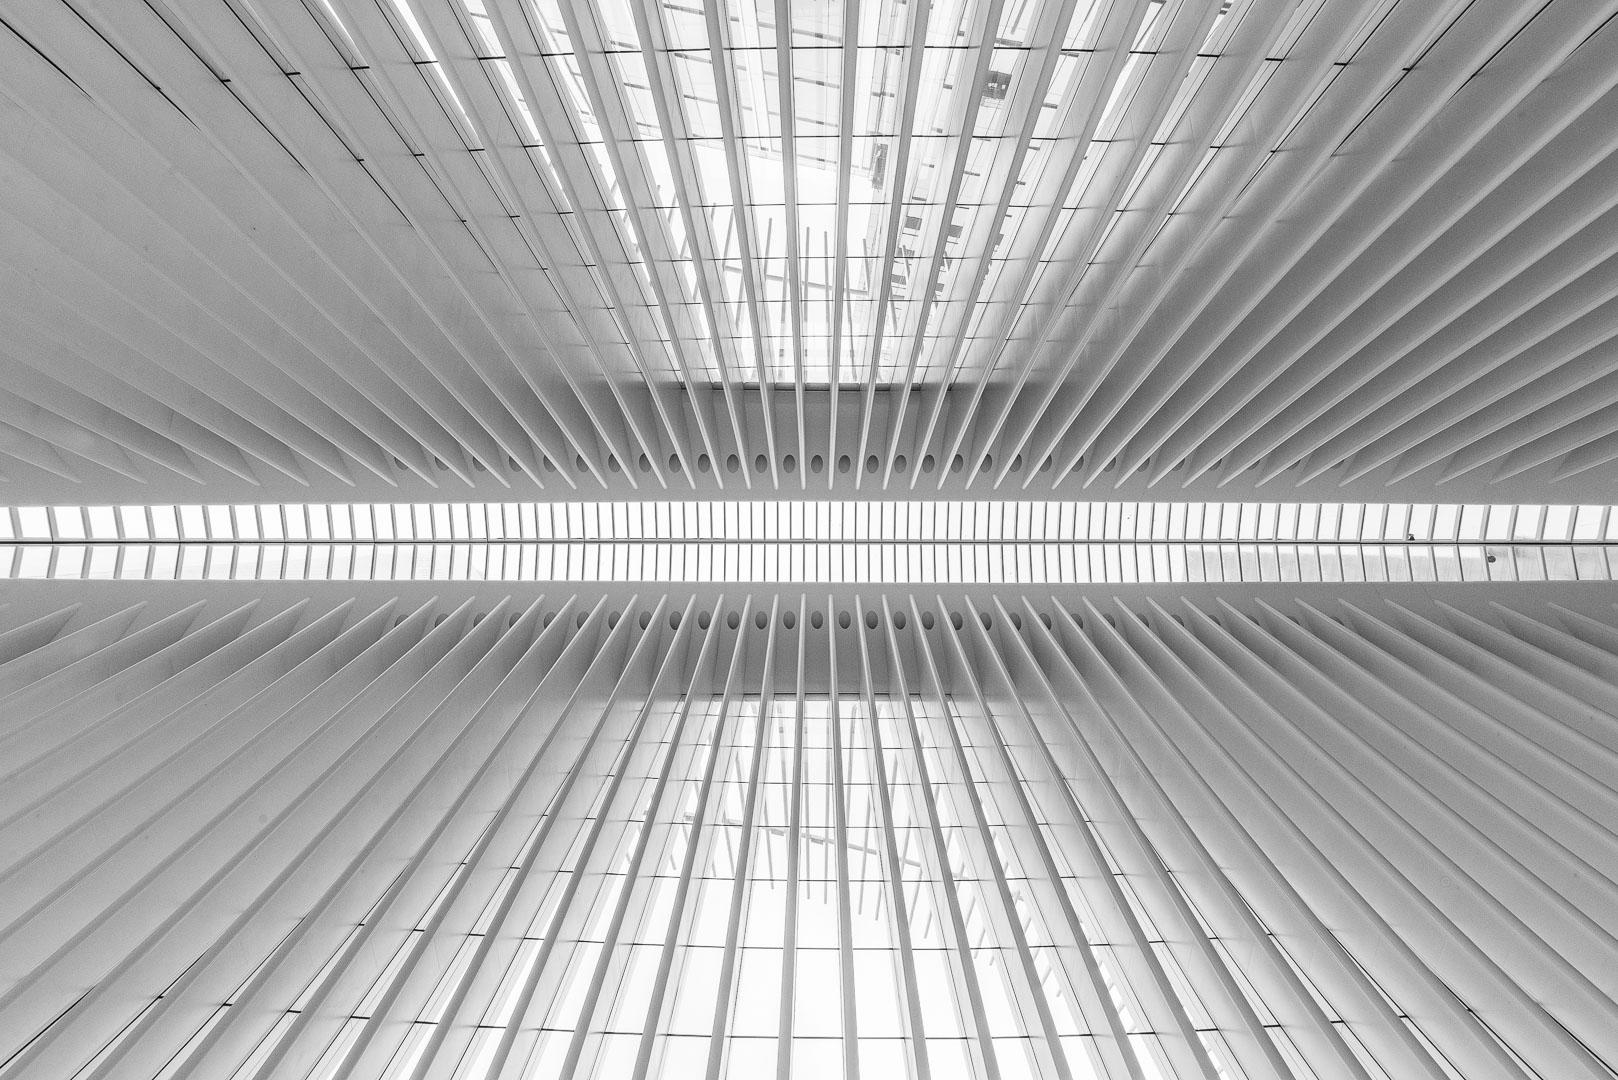 Ceiling detail of the World Trade Center Transportation Hub